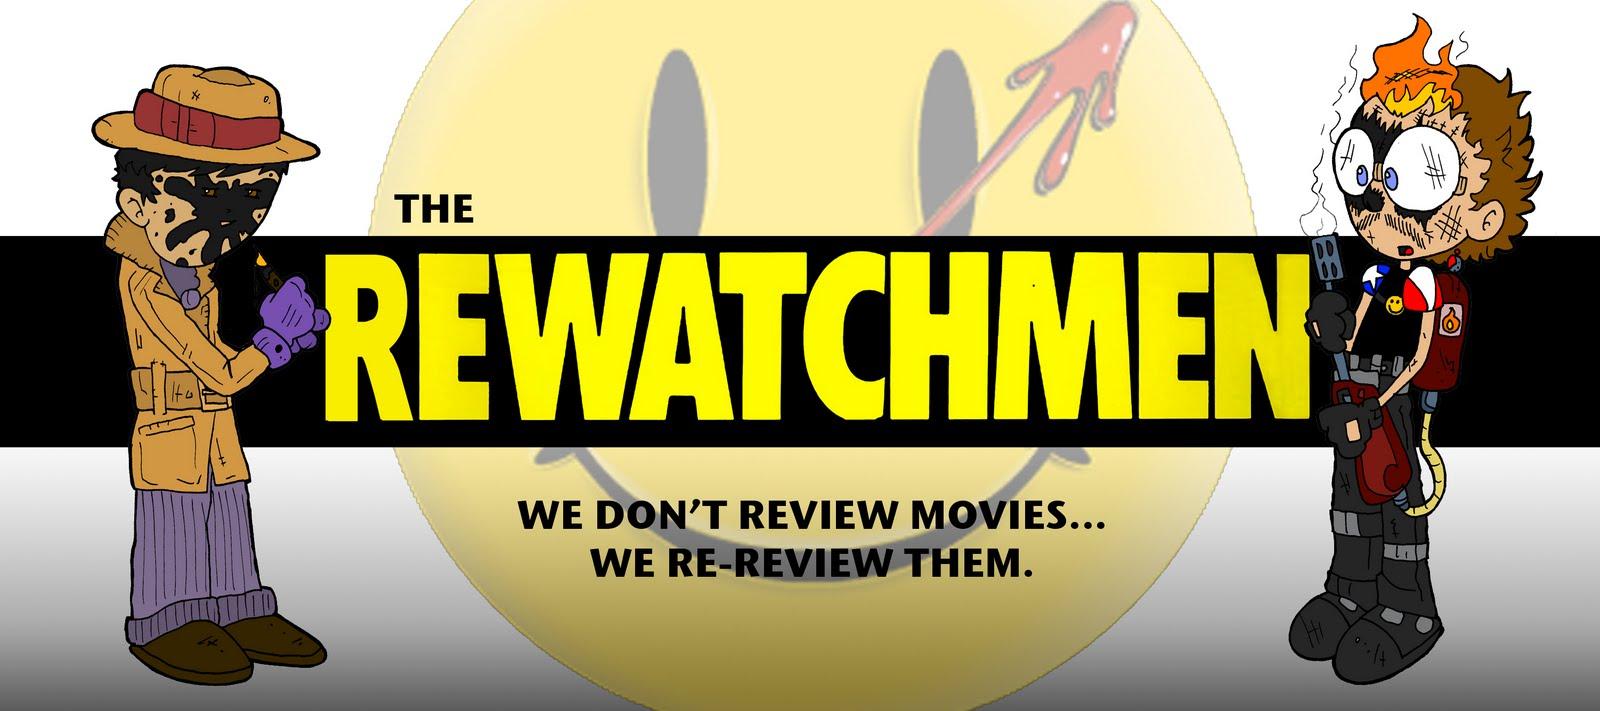 the Rewatchmen